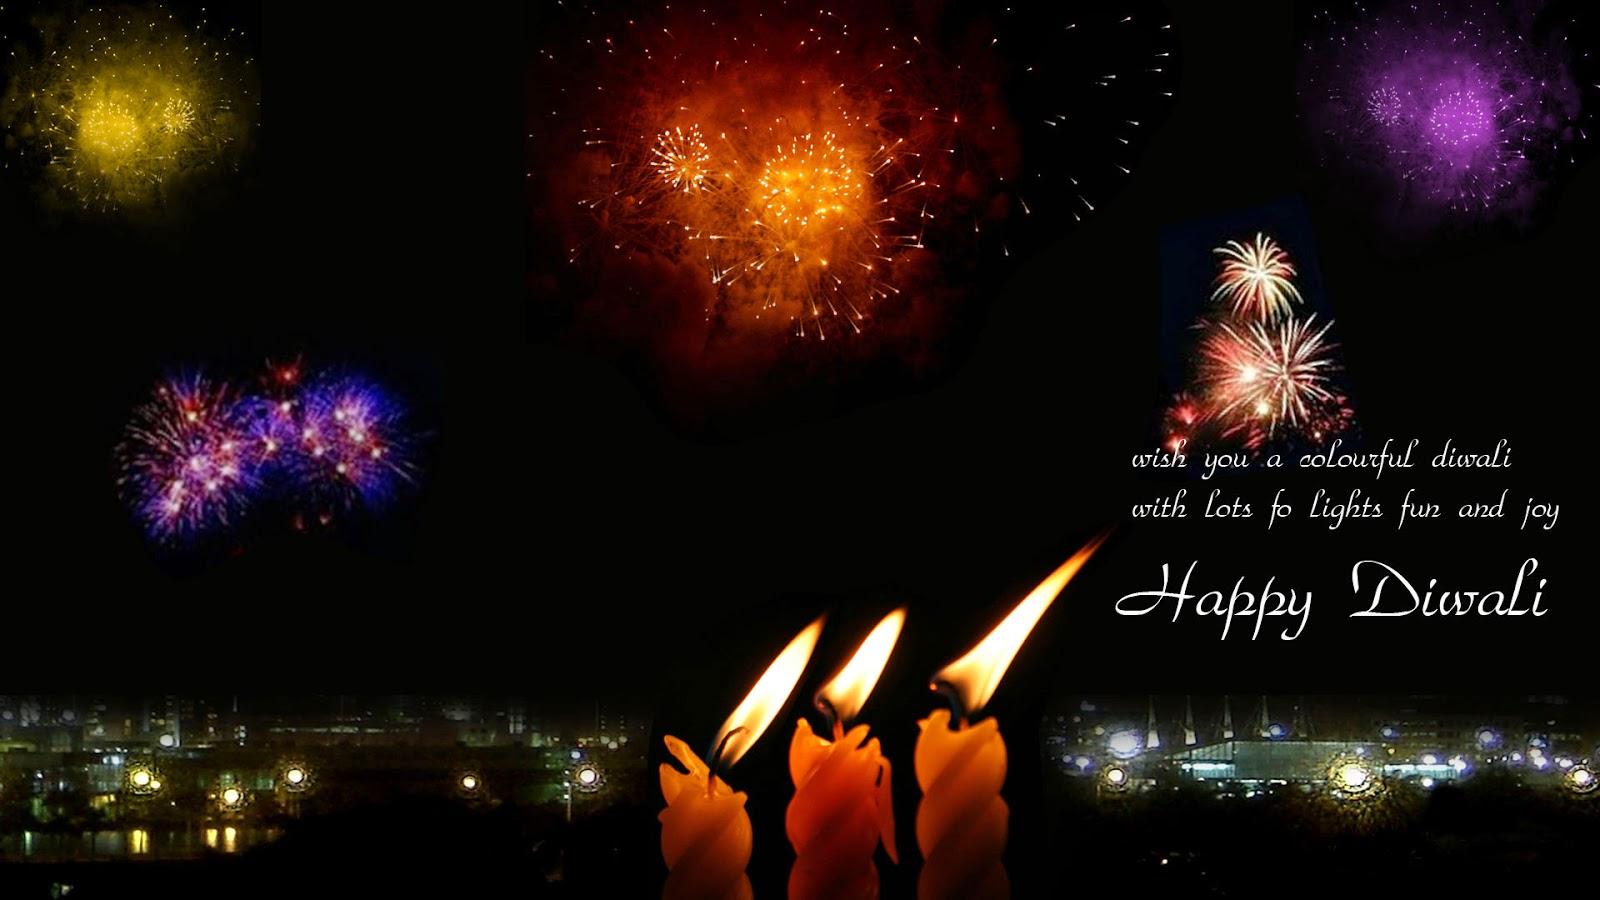 happy diwali 2014 messages